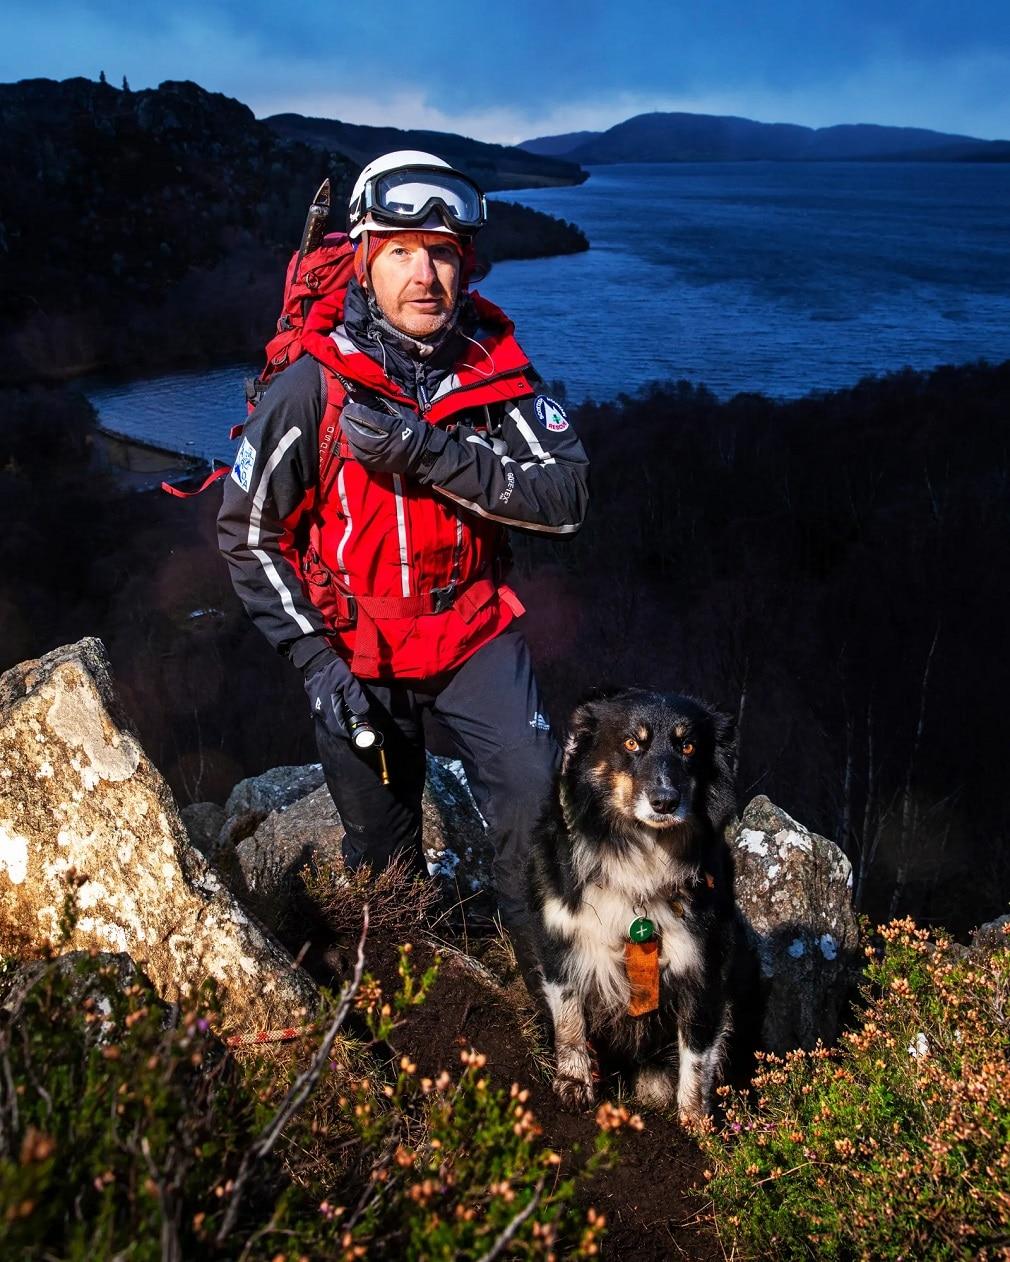 border collie mentokutya kutya skocia hegyek innes beaton nap fotoja